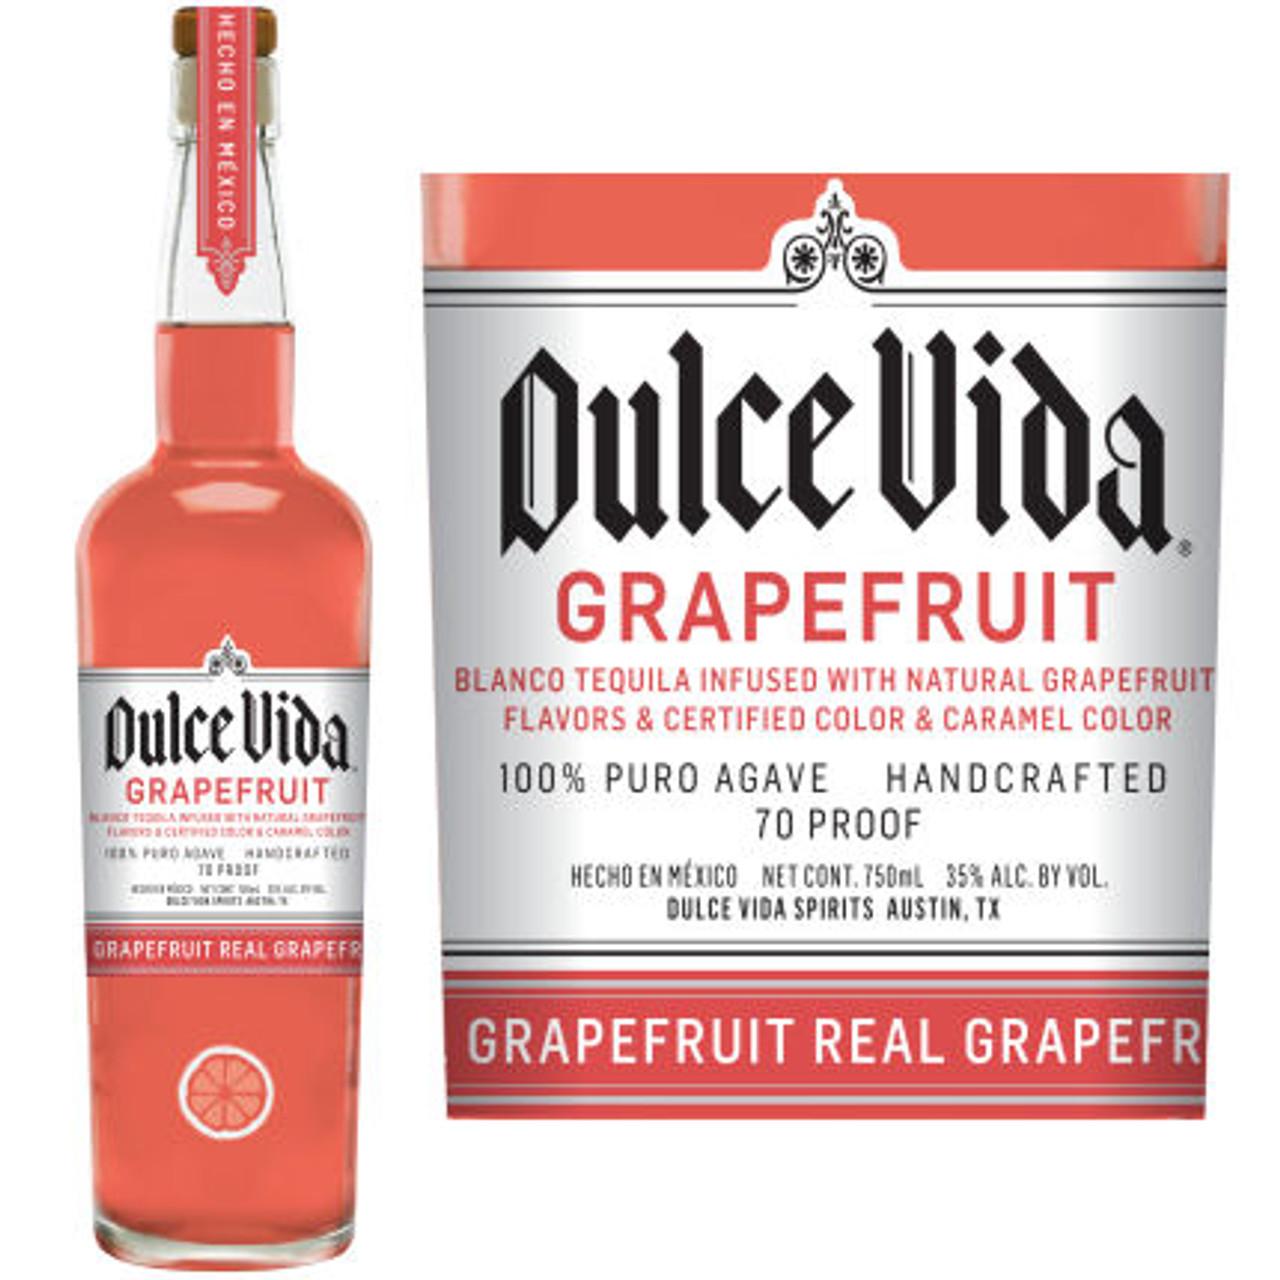 Dulce Vida Grapefruit 750mlReg. Price $44.99